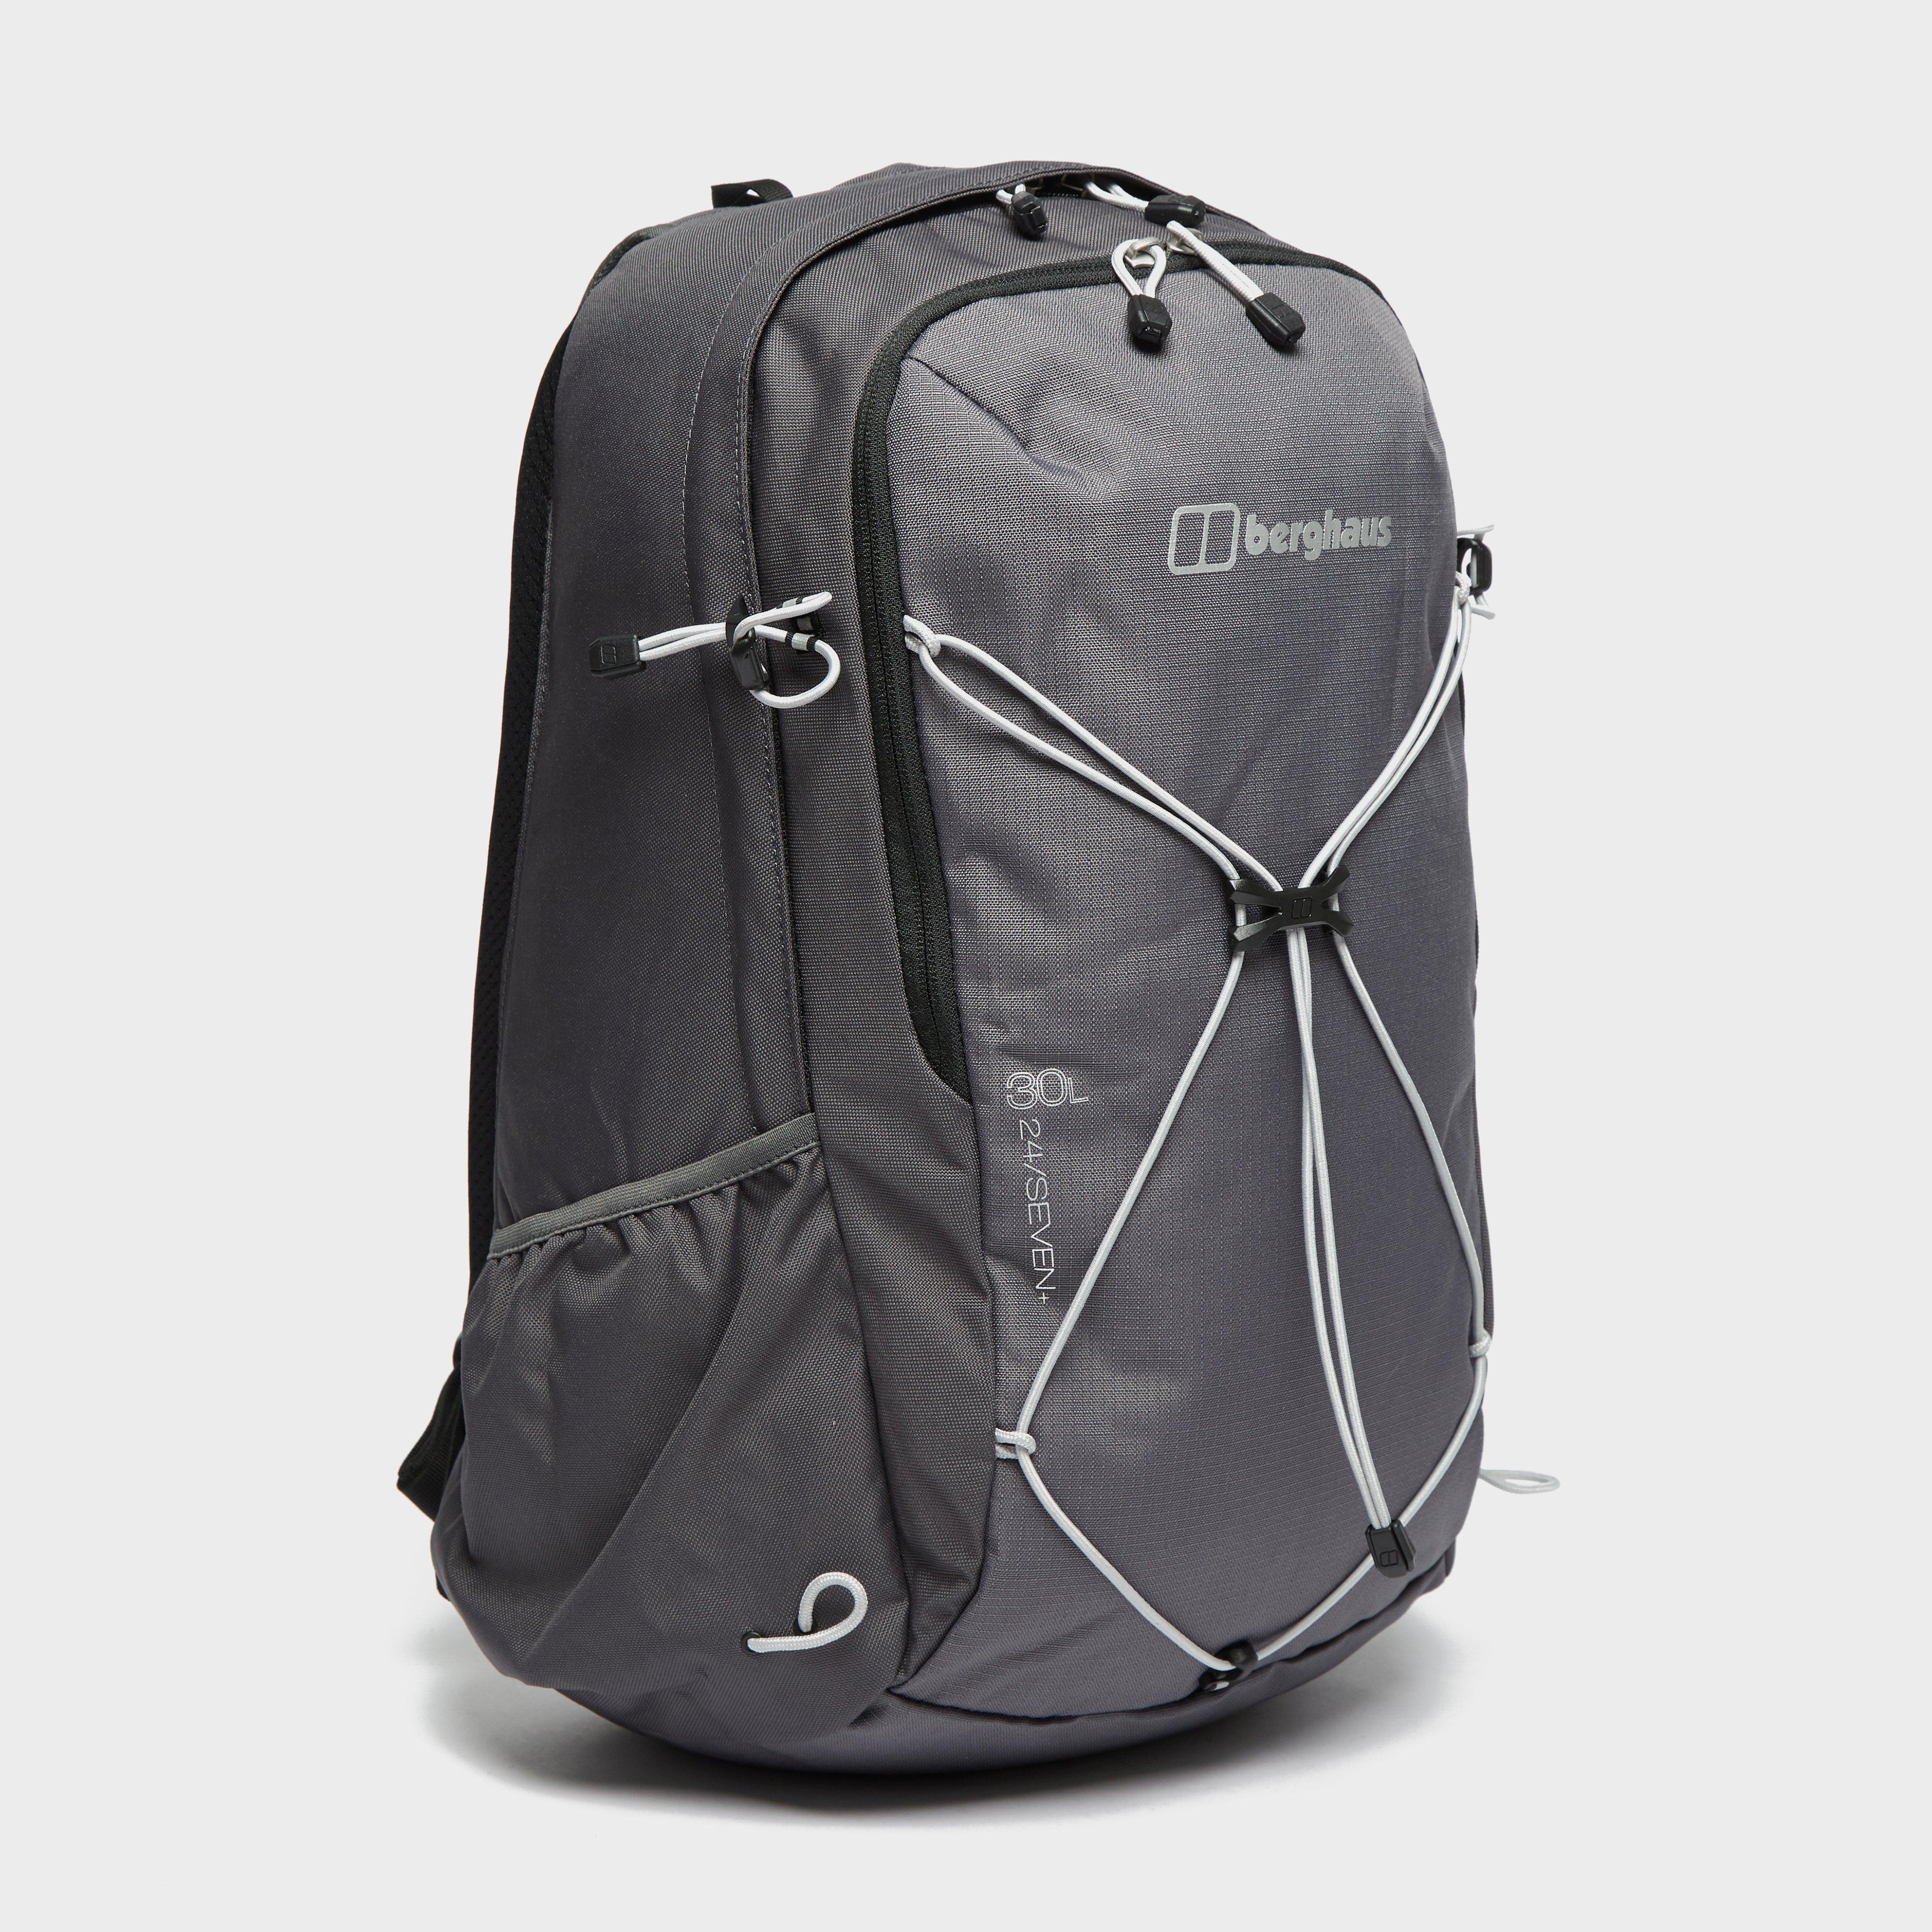 Berghaus Twentyfourseven 30 Backpack - Grey/dgy  Grey/dgy